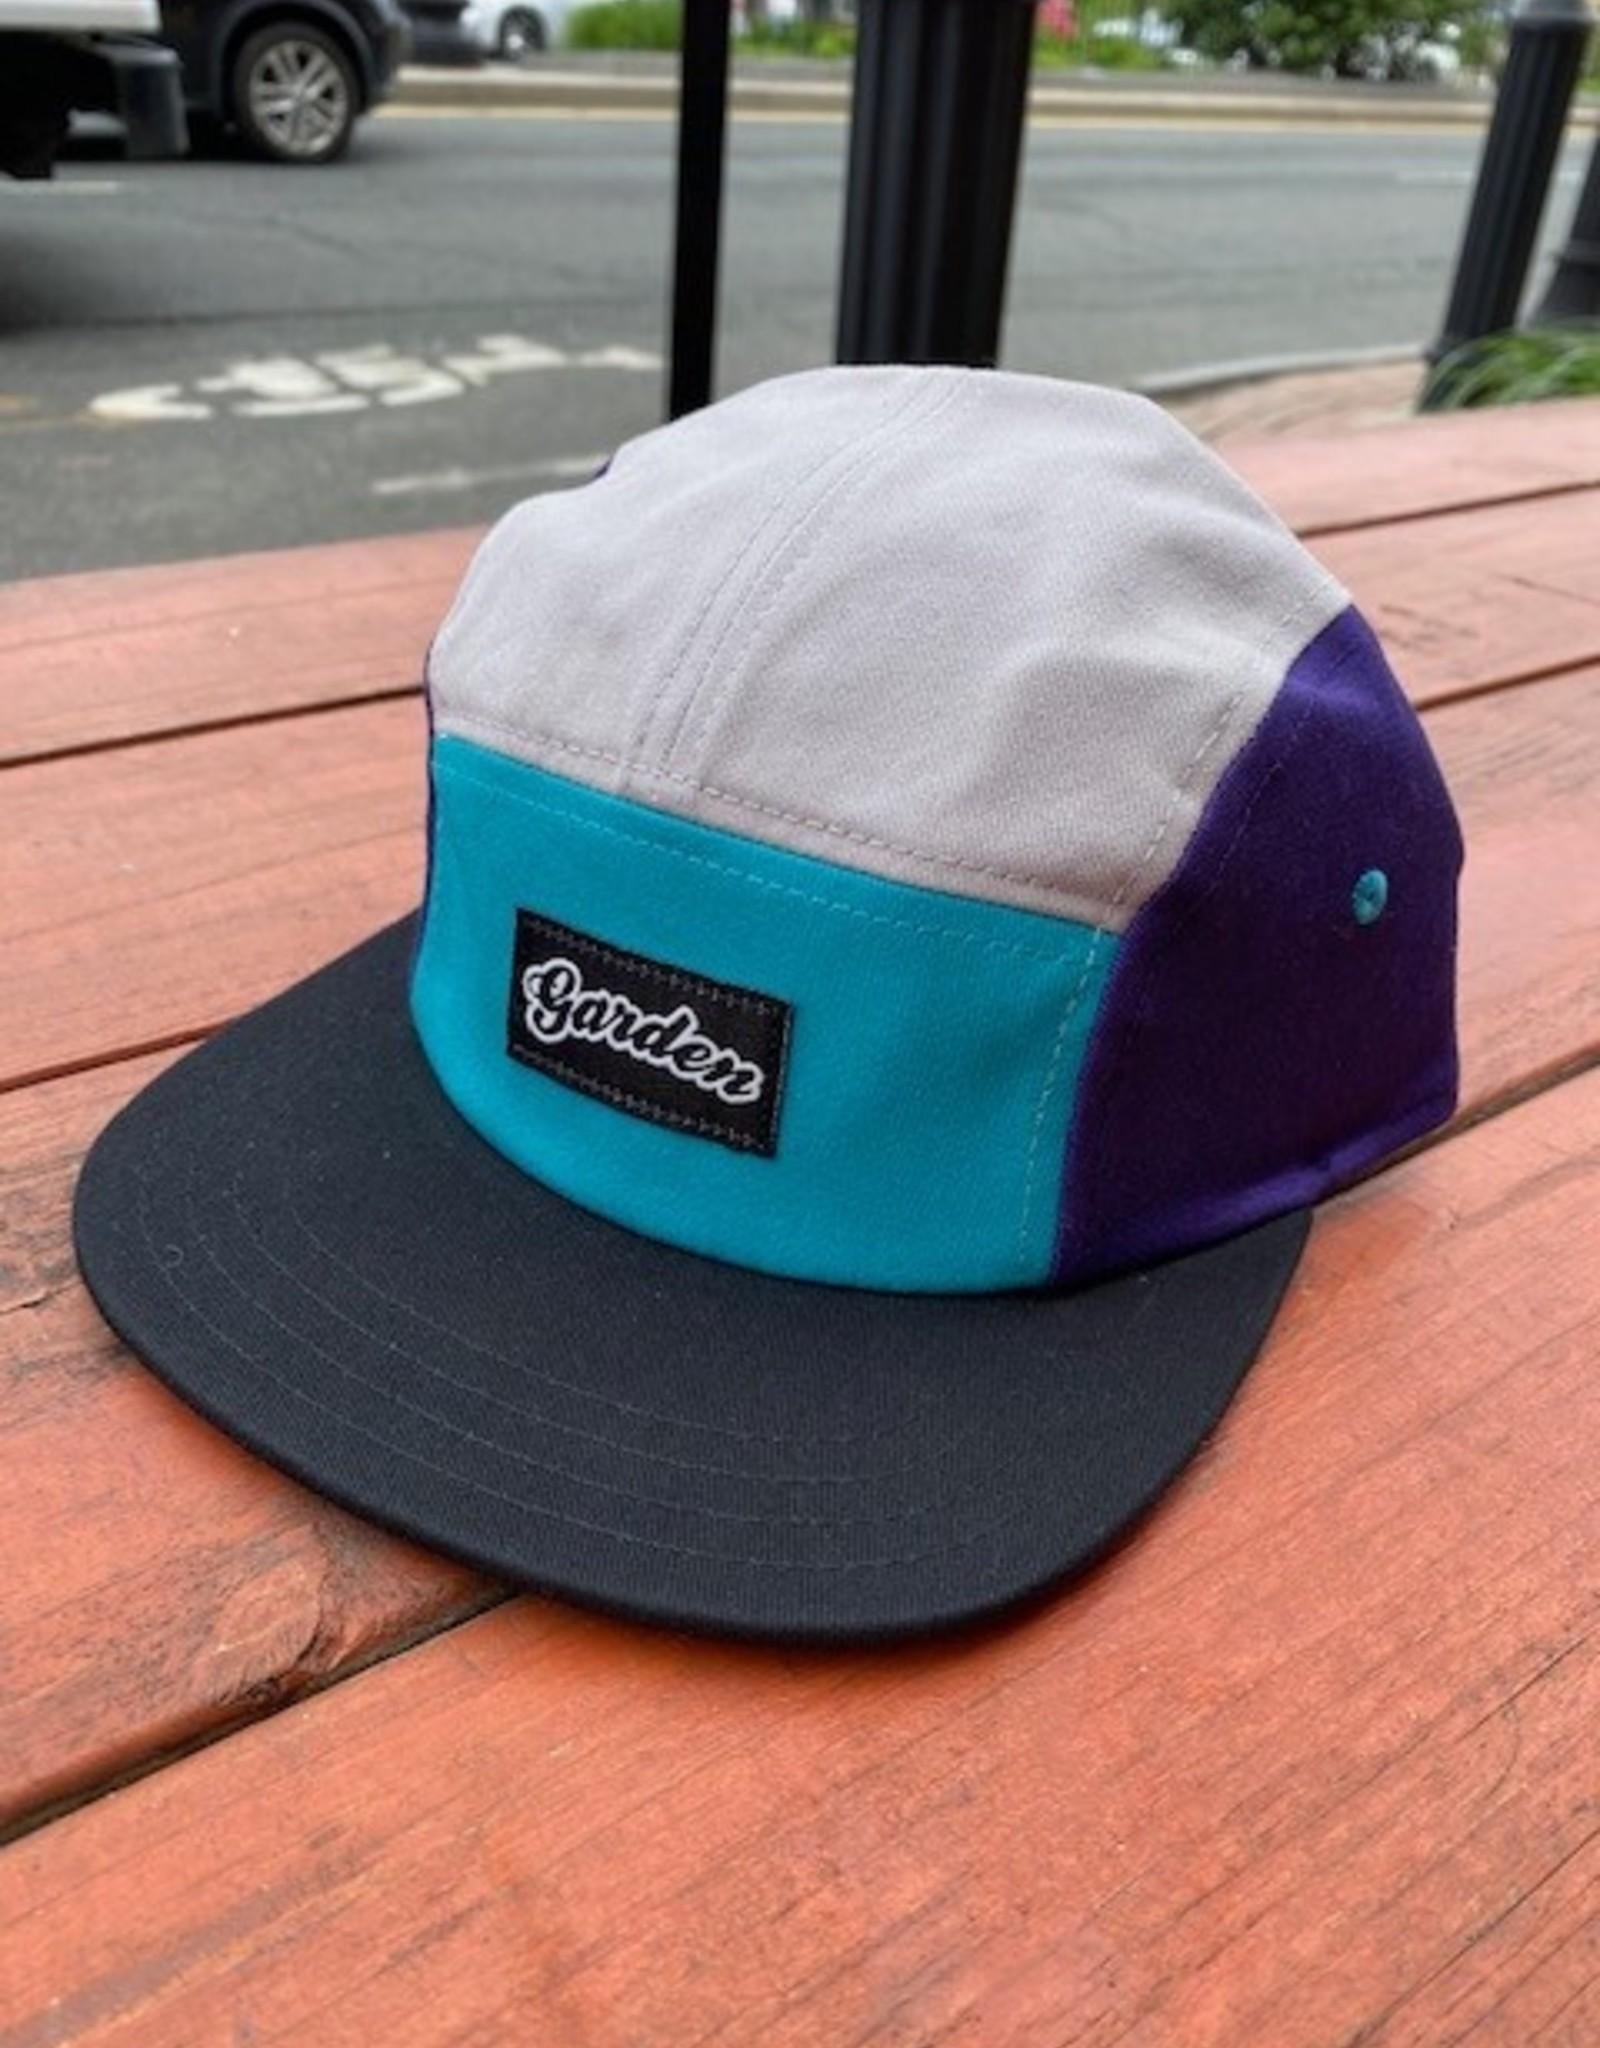 GARDEN GARDEN 5 PANEL CAMPER HAT TEAL/PURPLE/GREY CLIPBACK